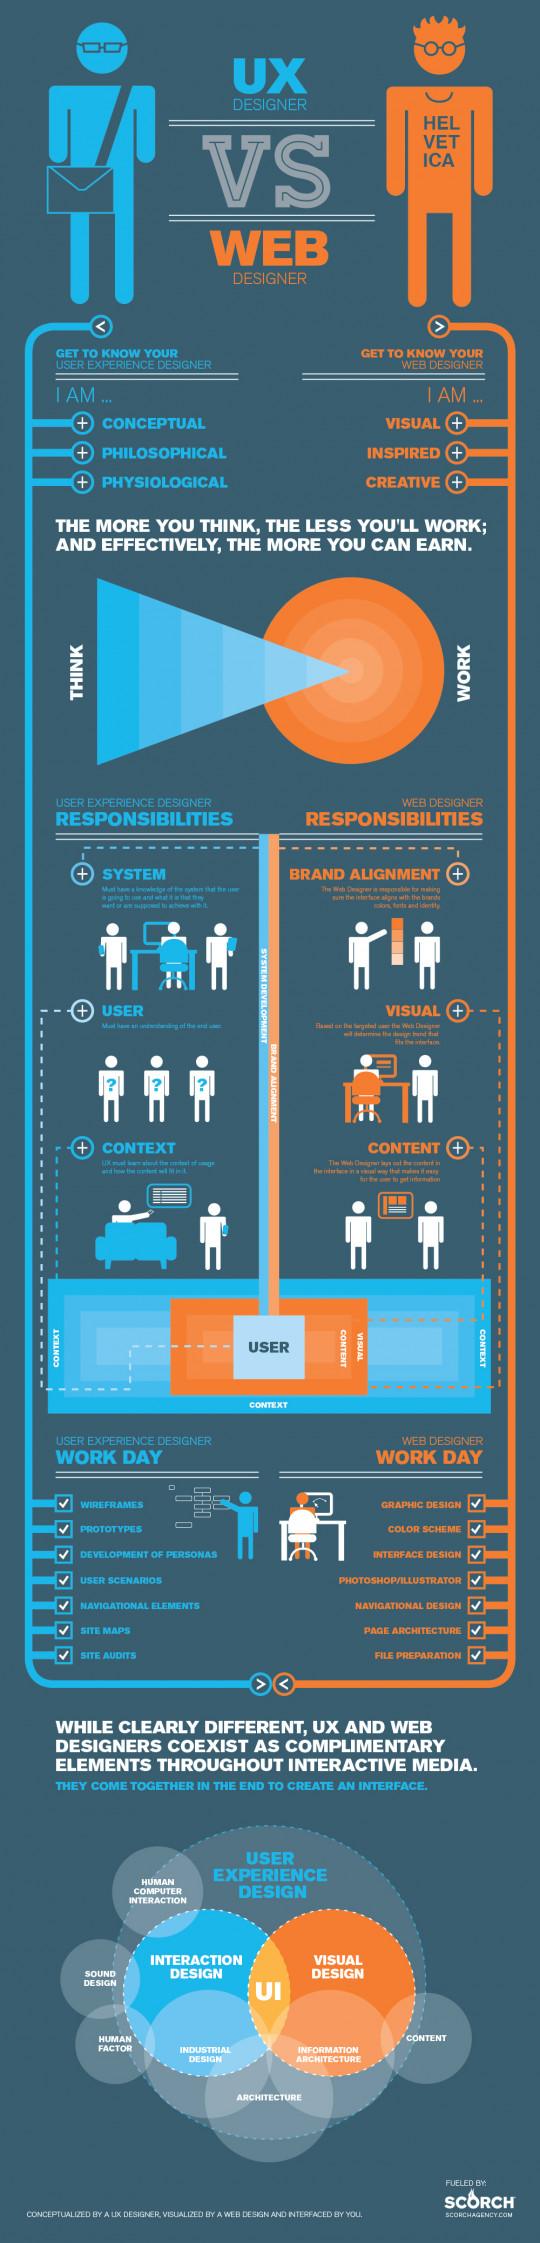 UX Designers vs Web Designers